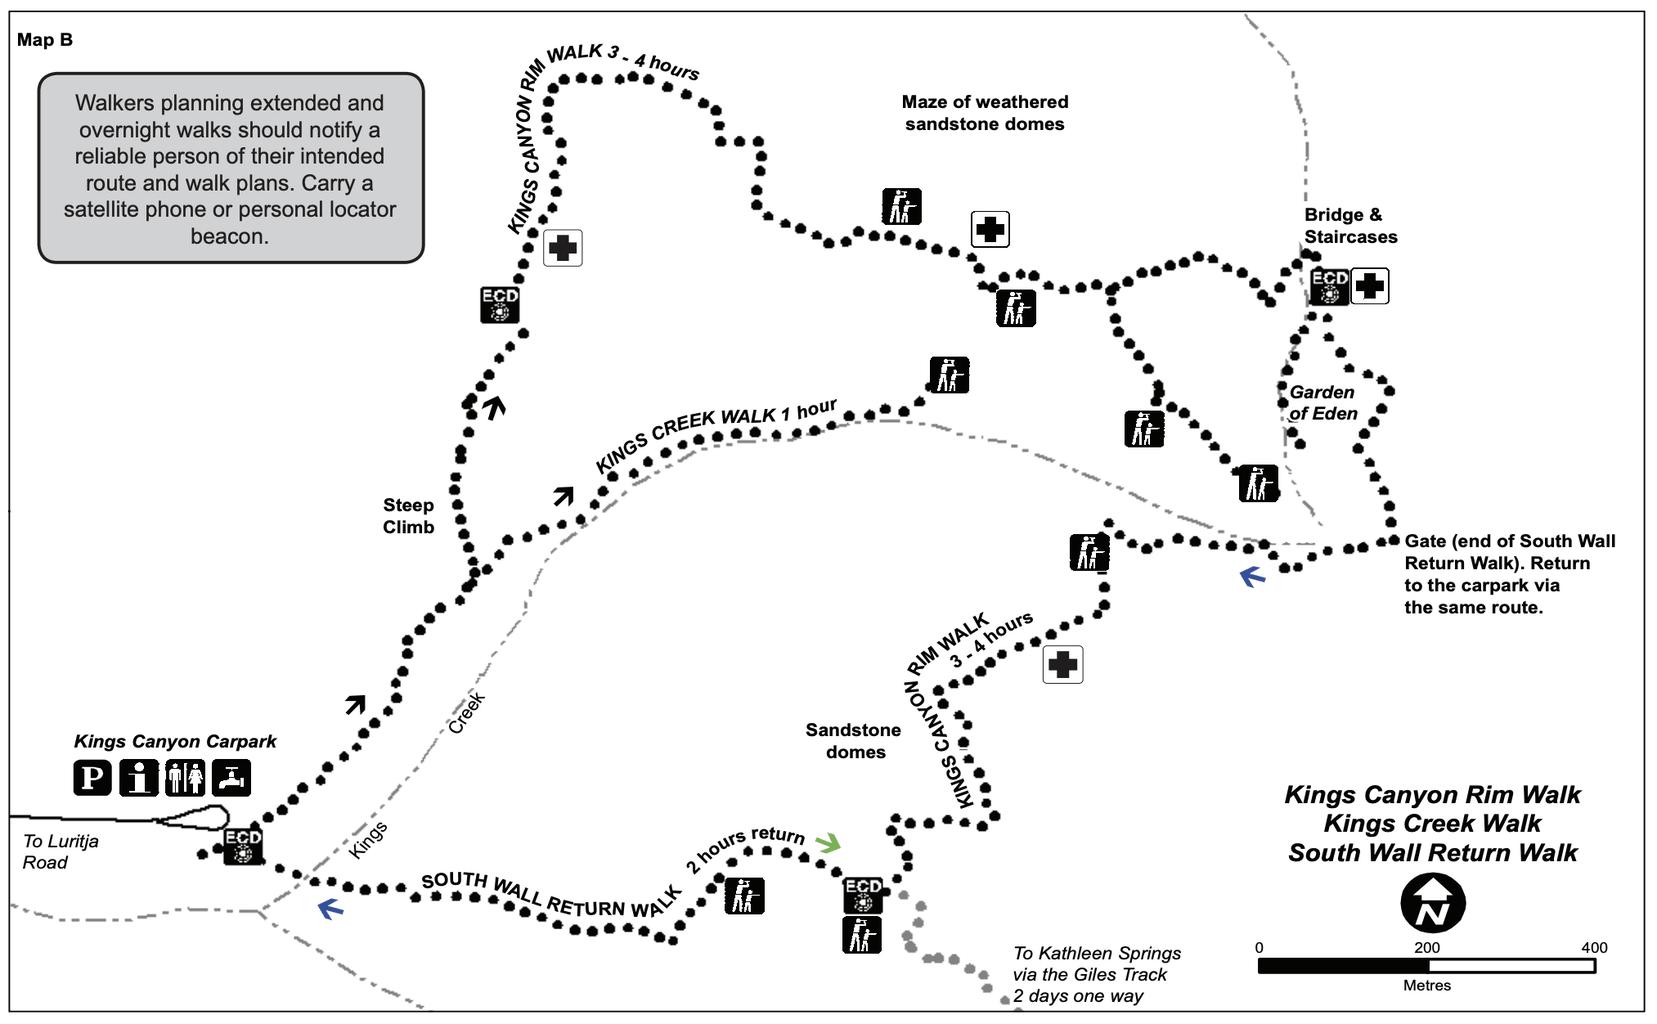 Kings Canyon Rim Walk Map